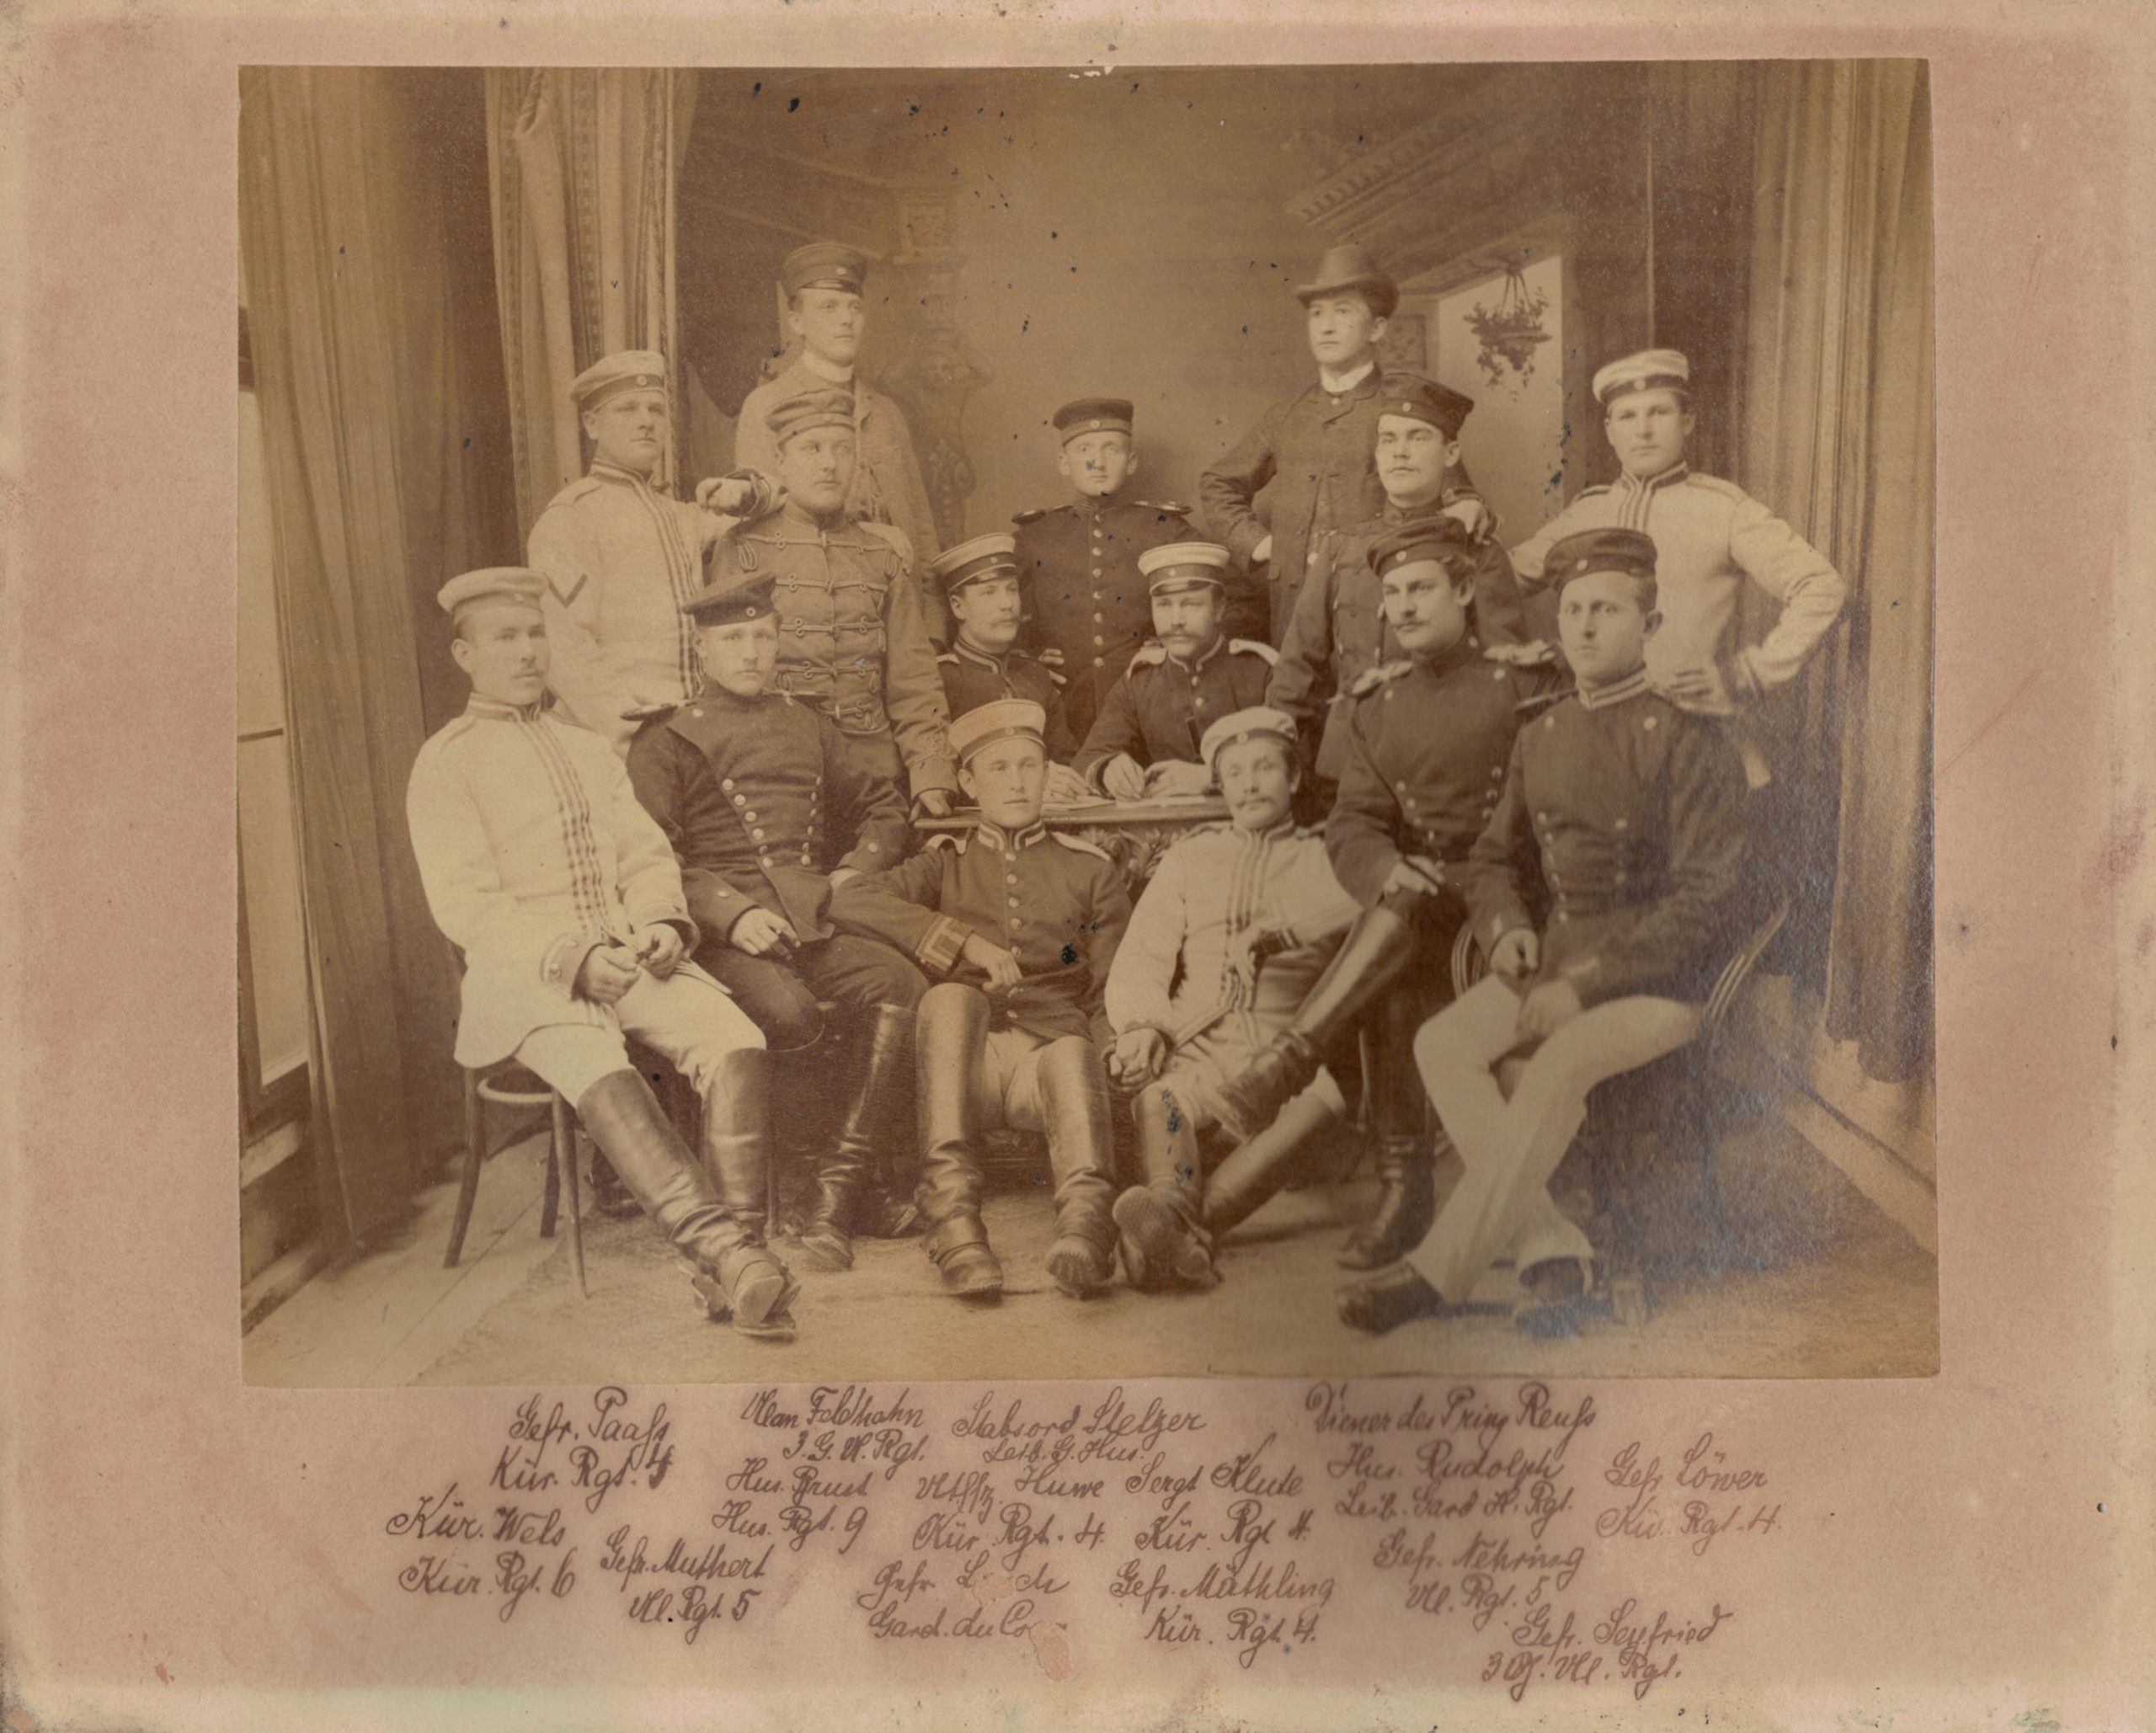 Ancienne Photographie - Photo atelier - Prusse - Uniforme - Guerre 14/18 - Service Militaire - Cuirassier - Uhlan - Hussard